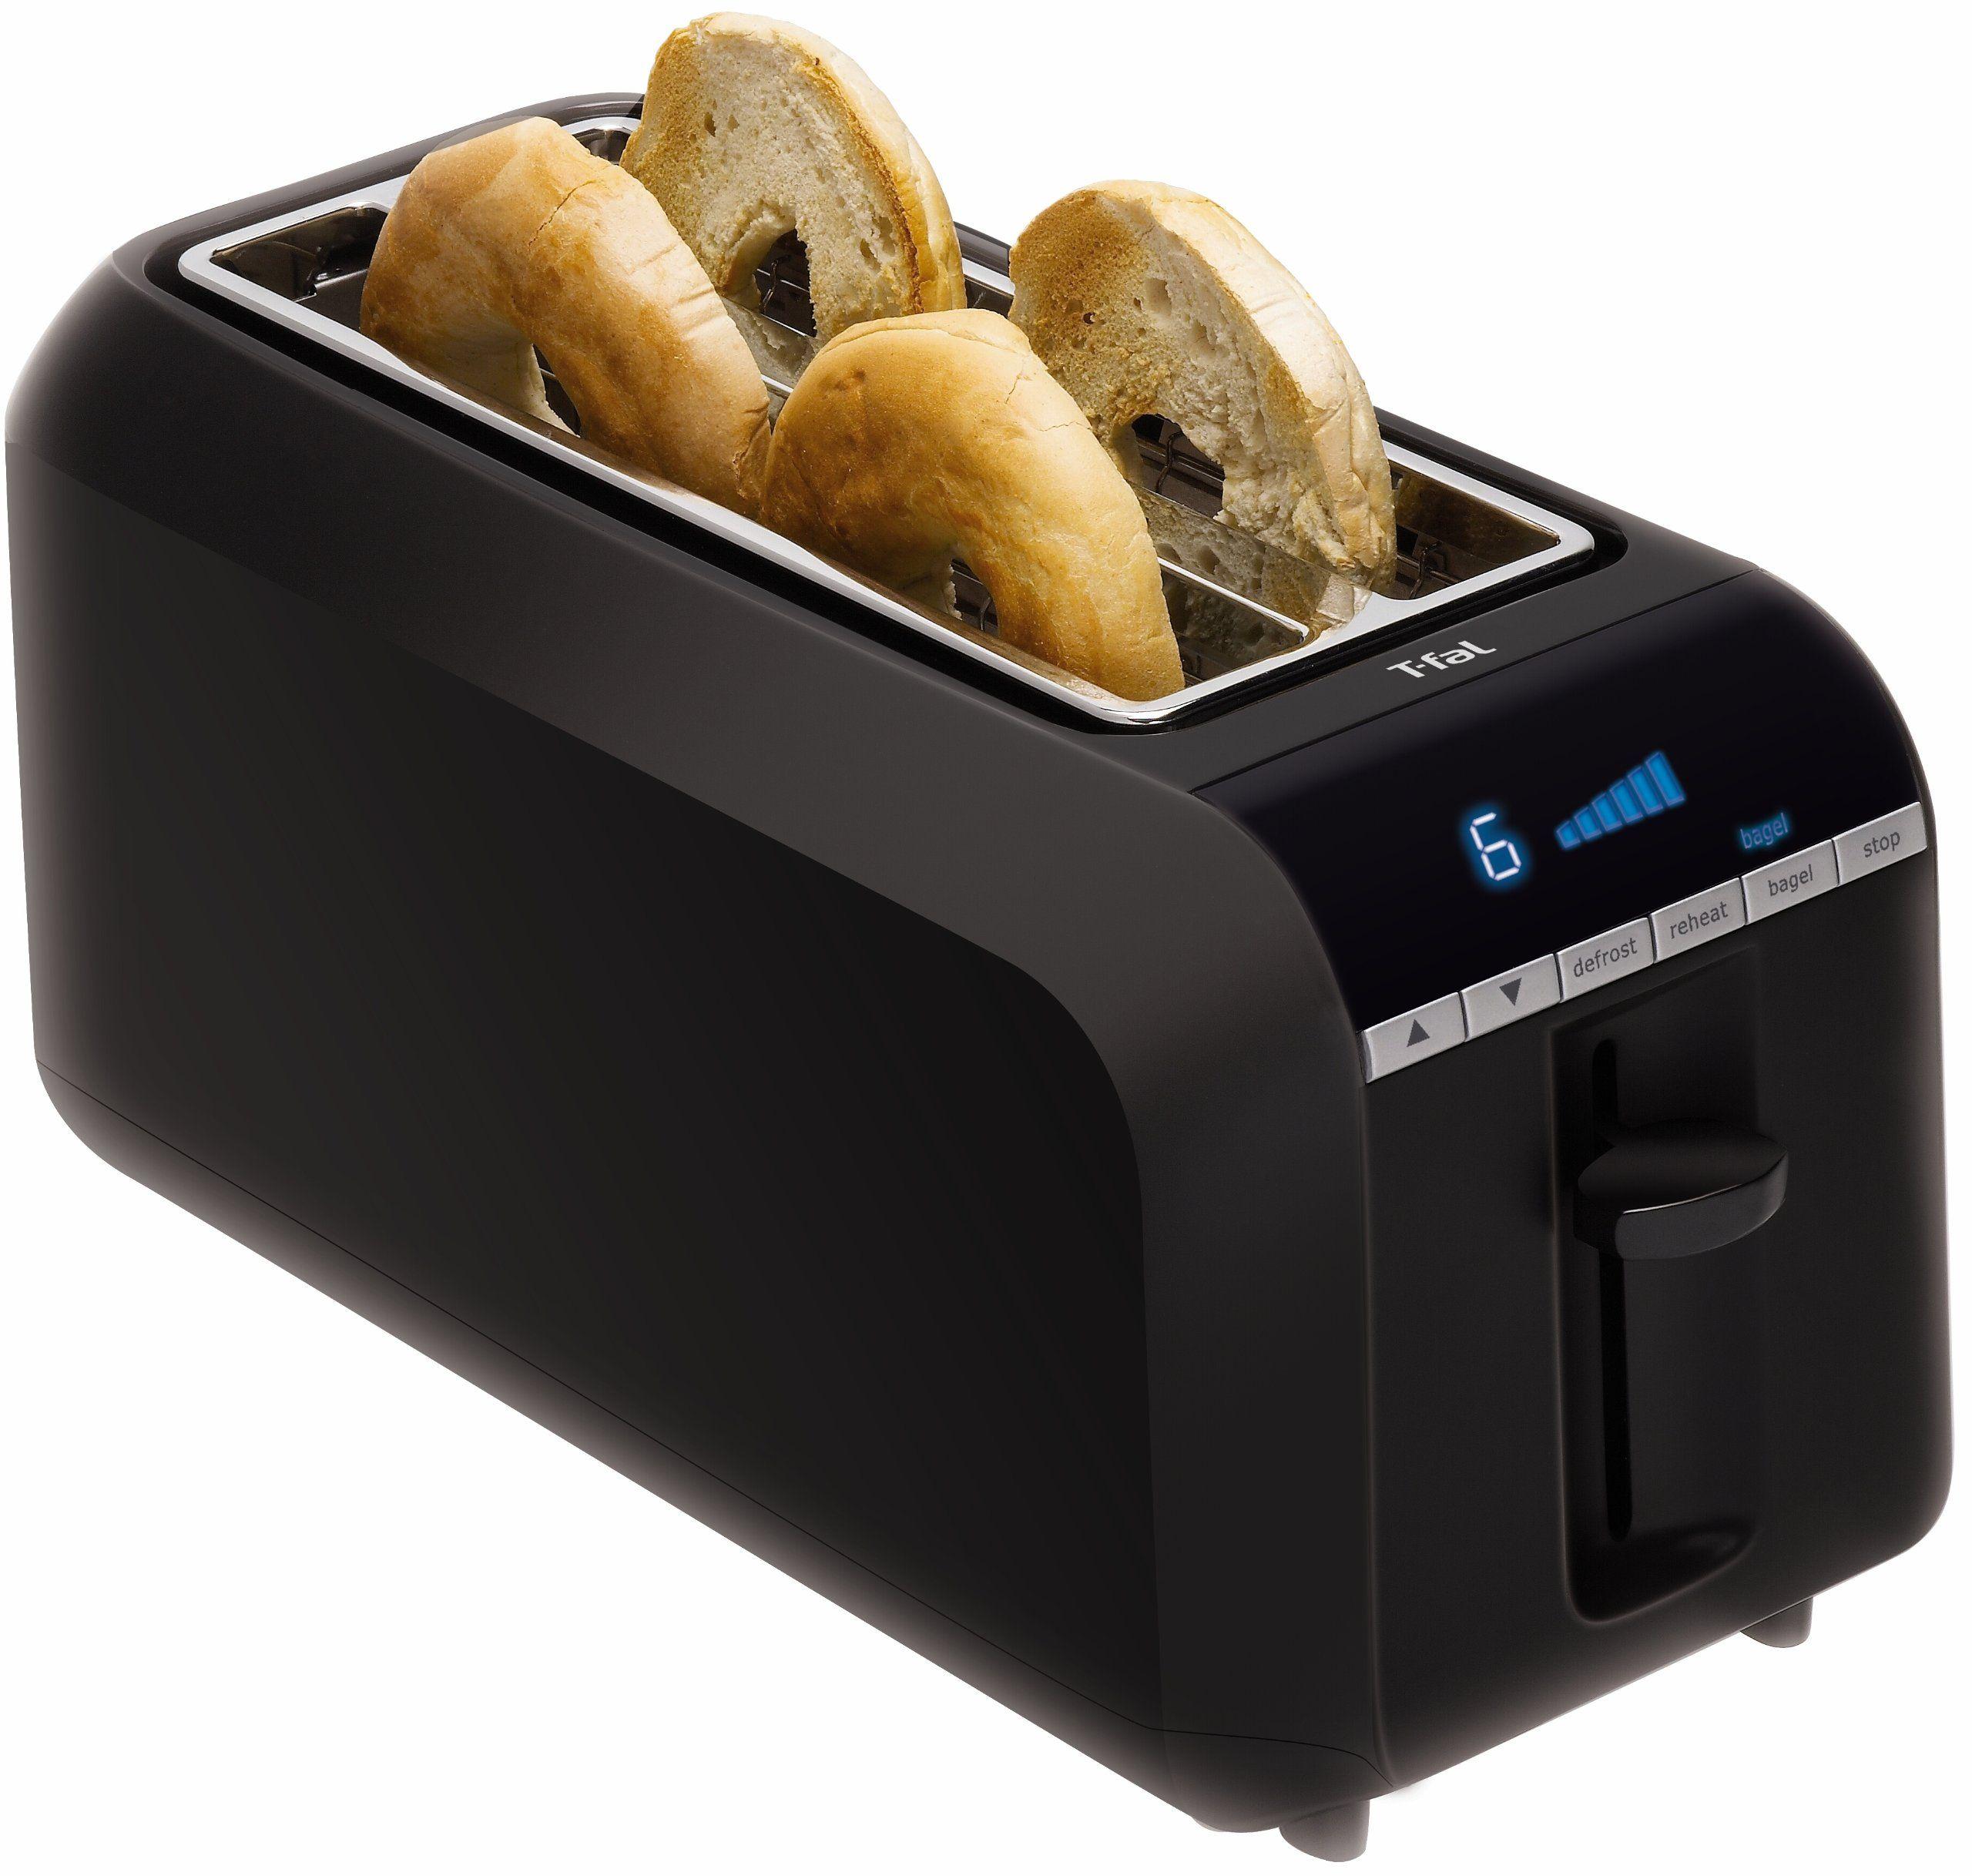 com slice stainless walmart toaster steel black decker reviews product